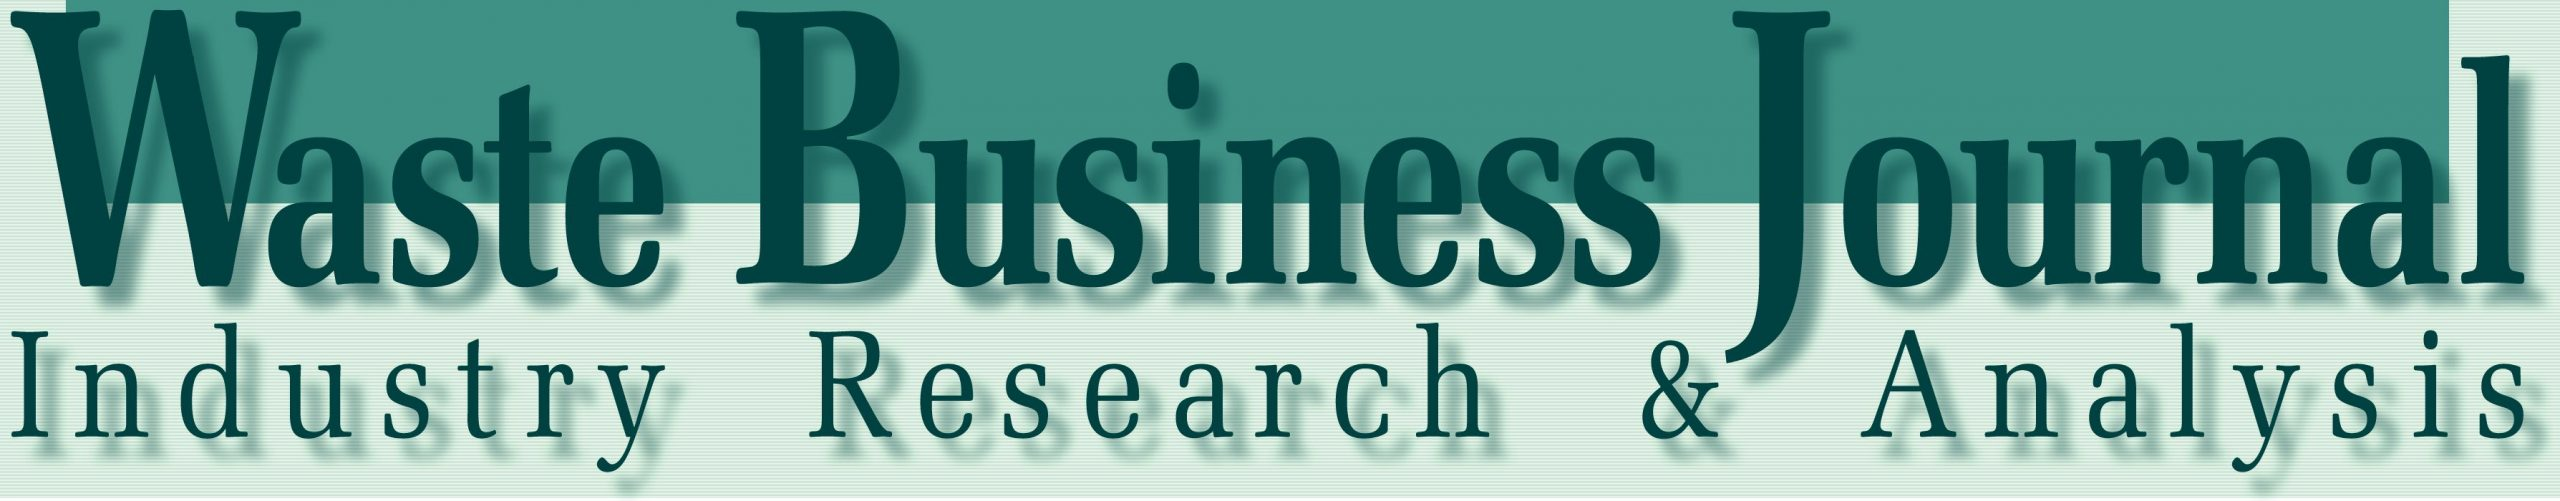 Waste Business Journal Logo